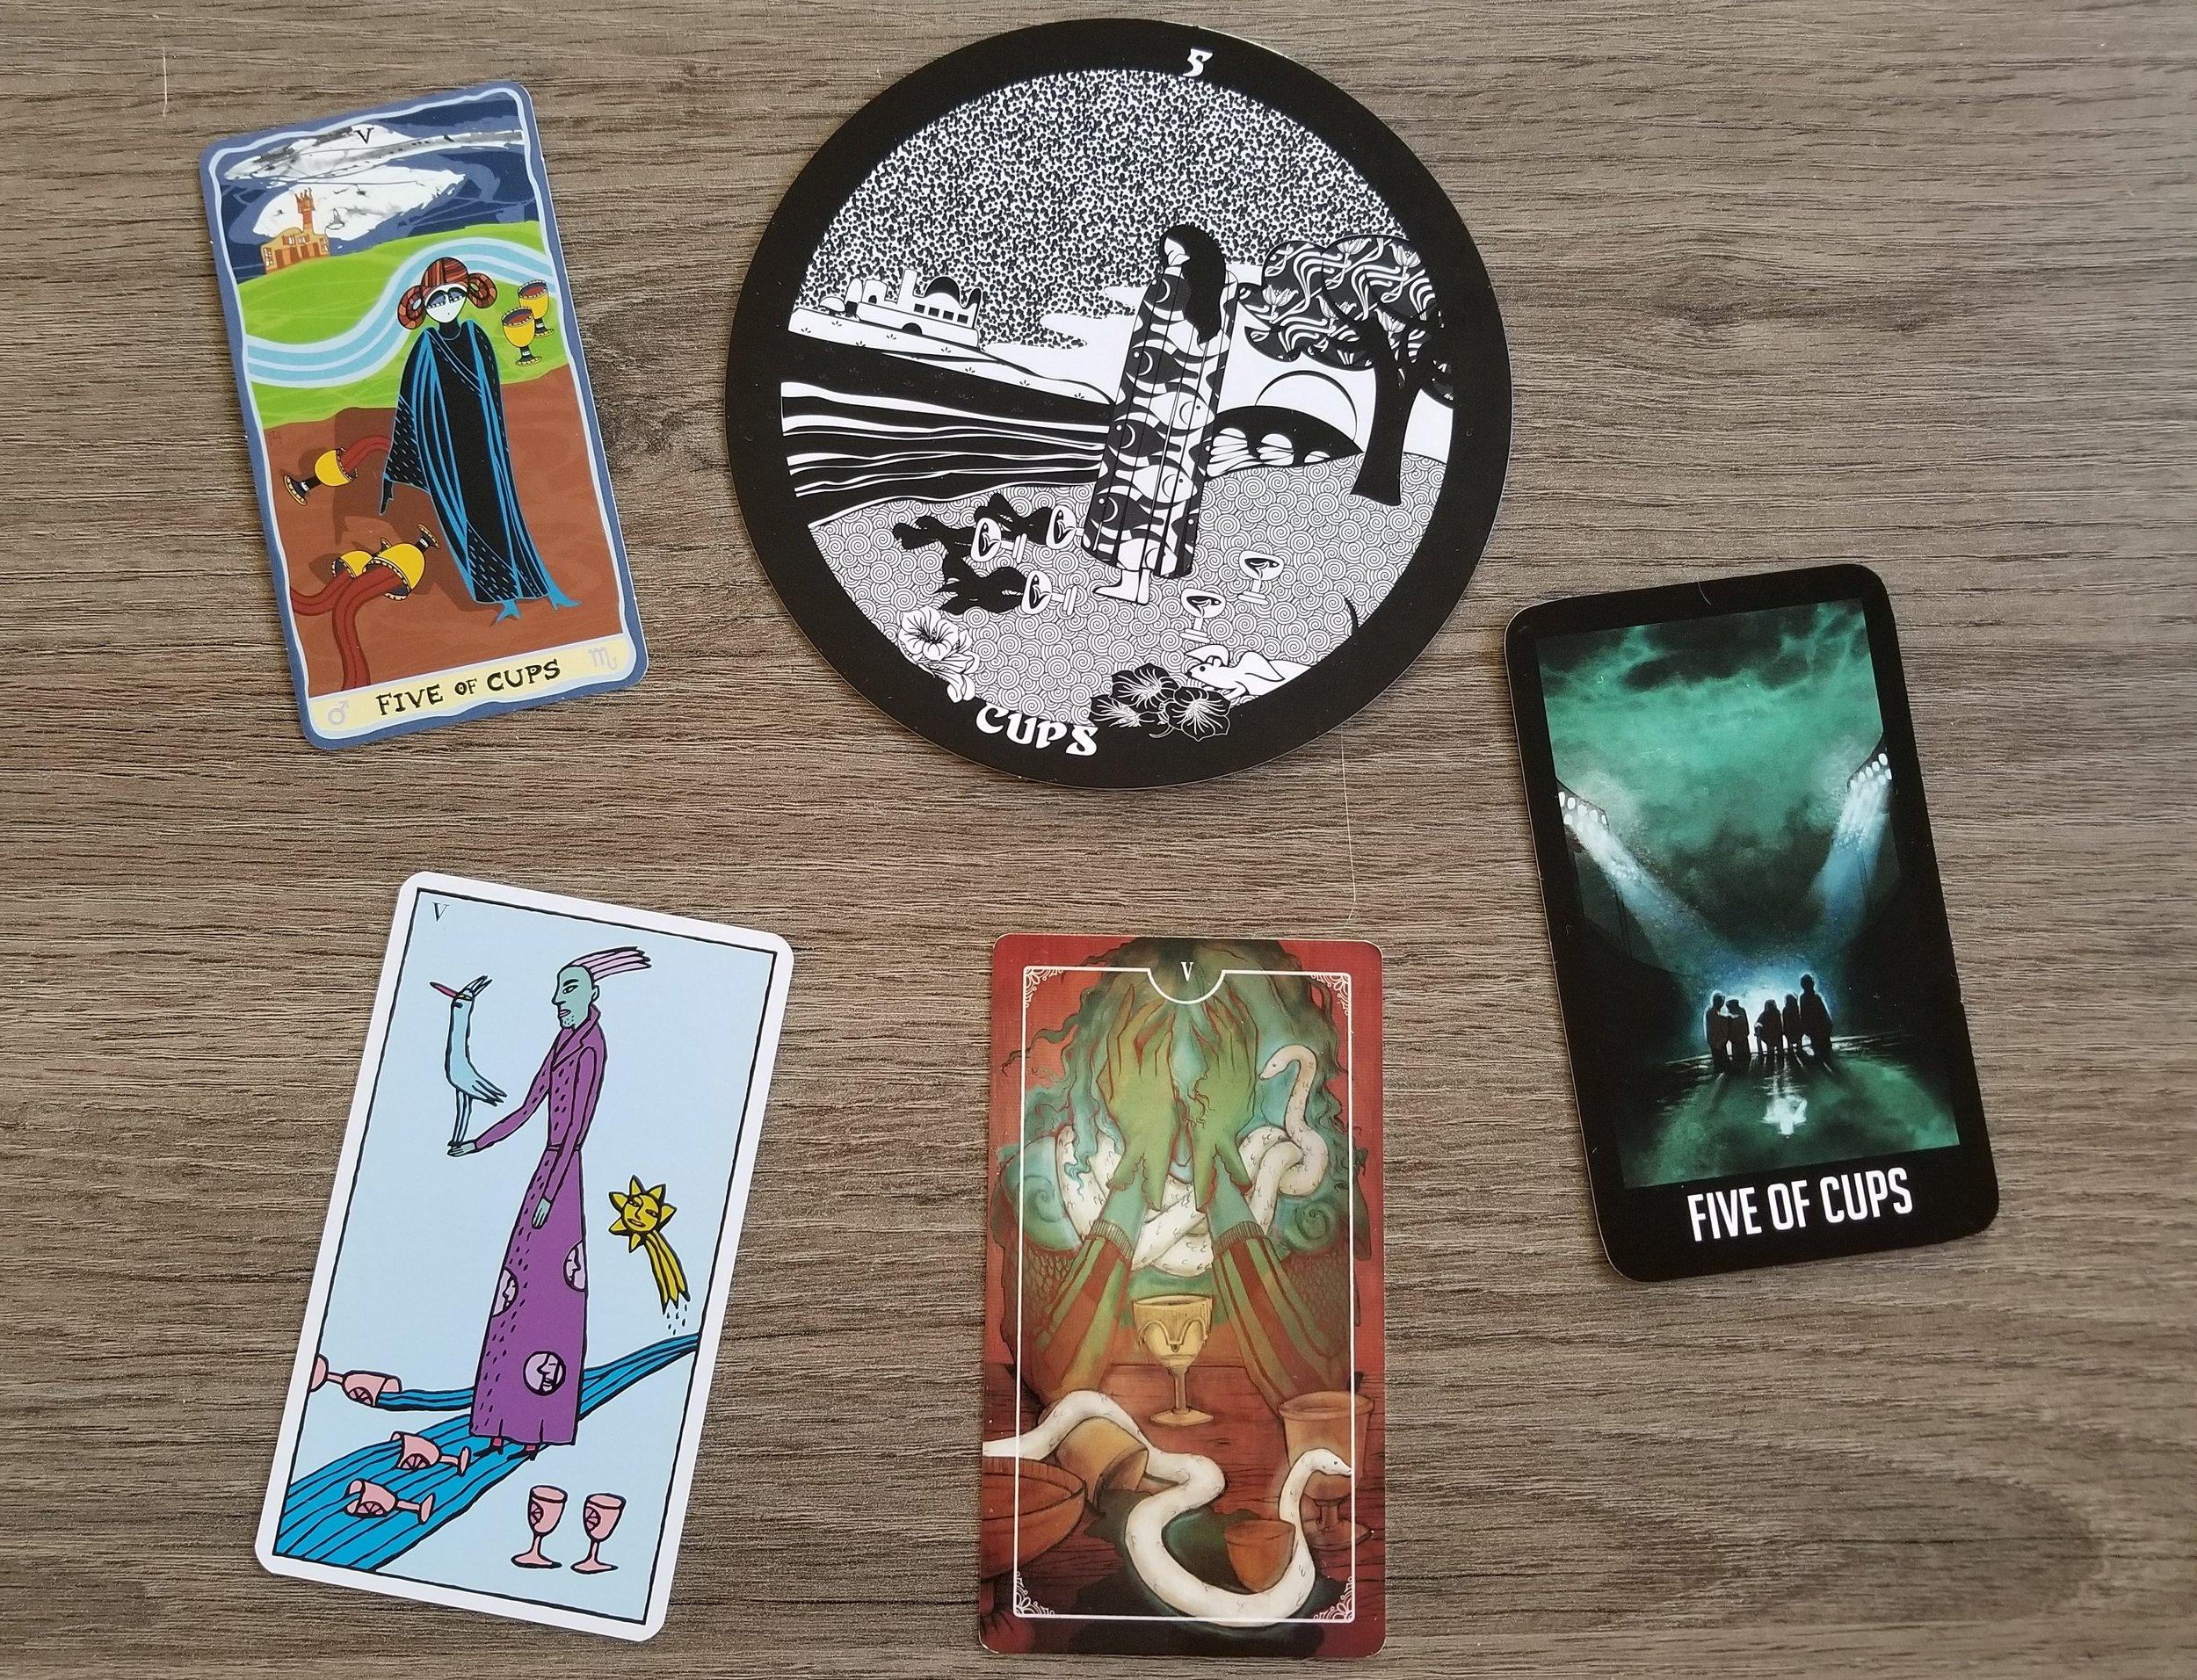 Five of Cups from the Sakki Sakki Tarot, Gorgon's Tarot, Kitty Kahane Tarot, Ostara Tarot, and the Welcome to Night Vale Tarot